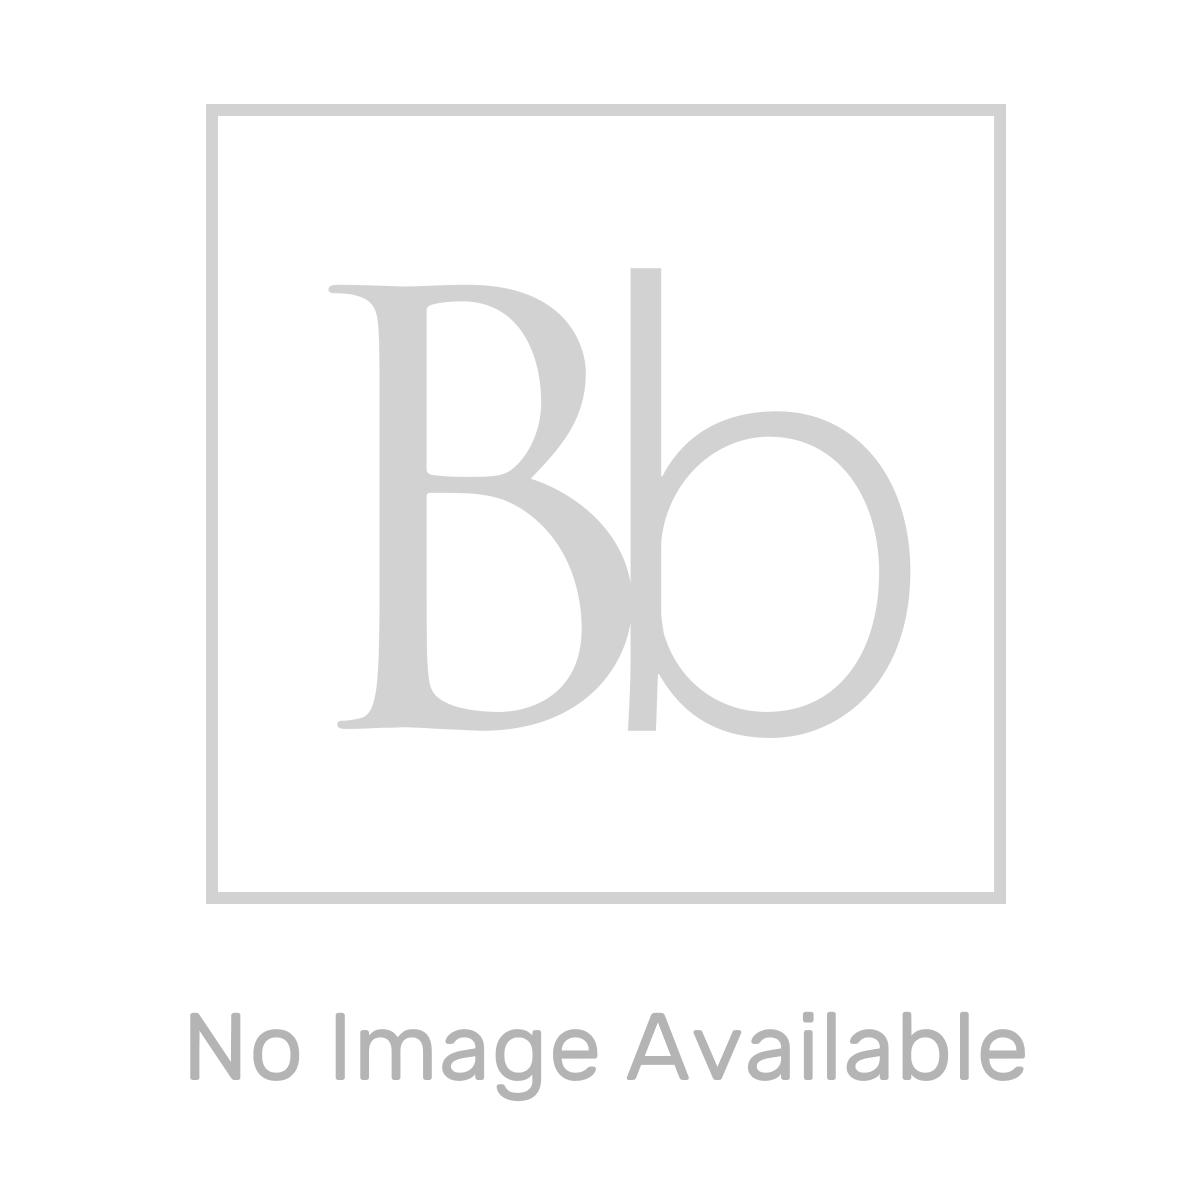 RAK Washington Full Access Close Coupled Toilet